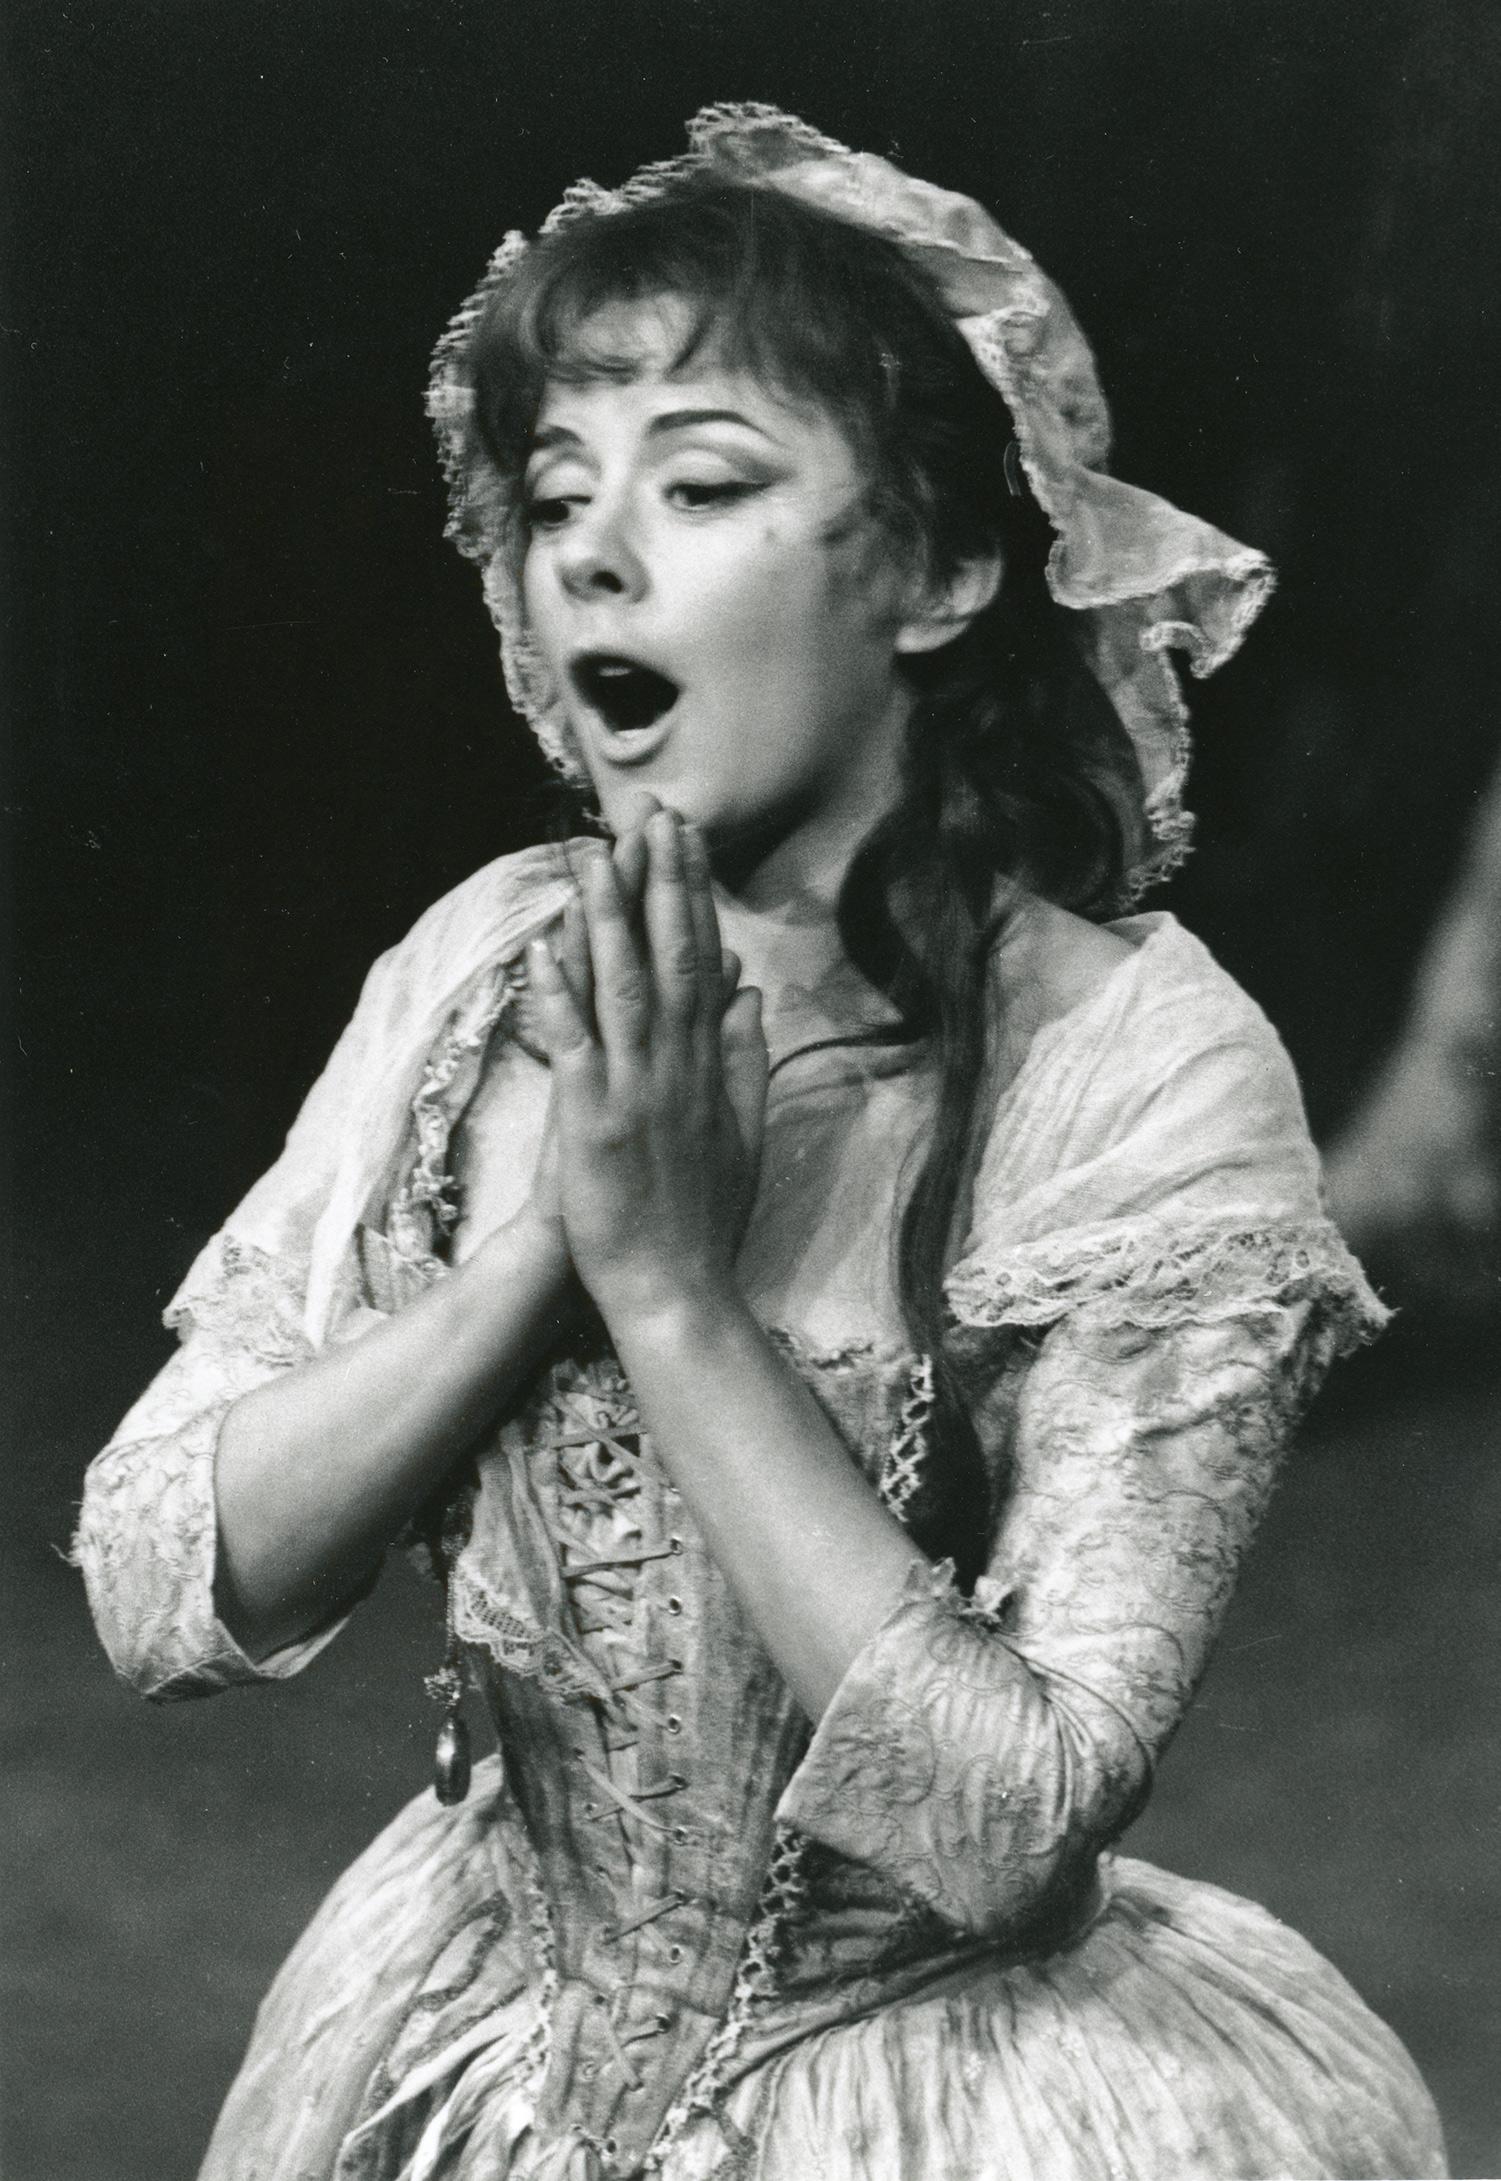 RSC-The Beggar_s Opera_ 1963_ Polly Peachum_1963_Photo by Reg Wilson _c_ RSC_301442